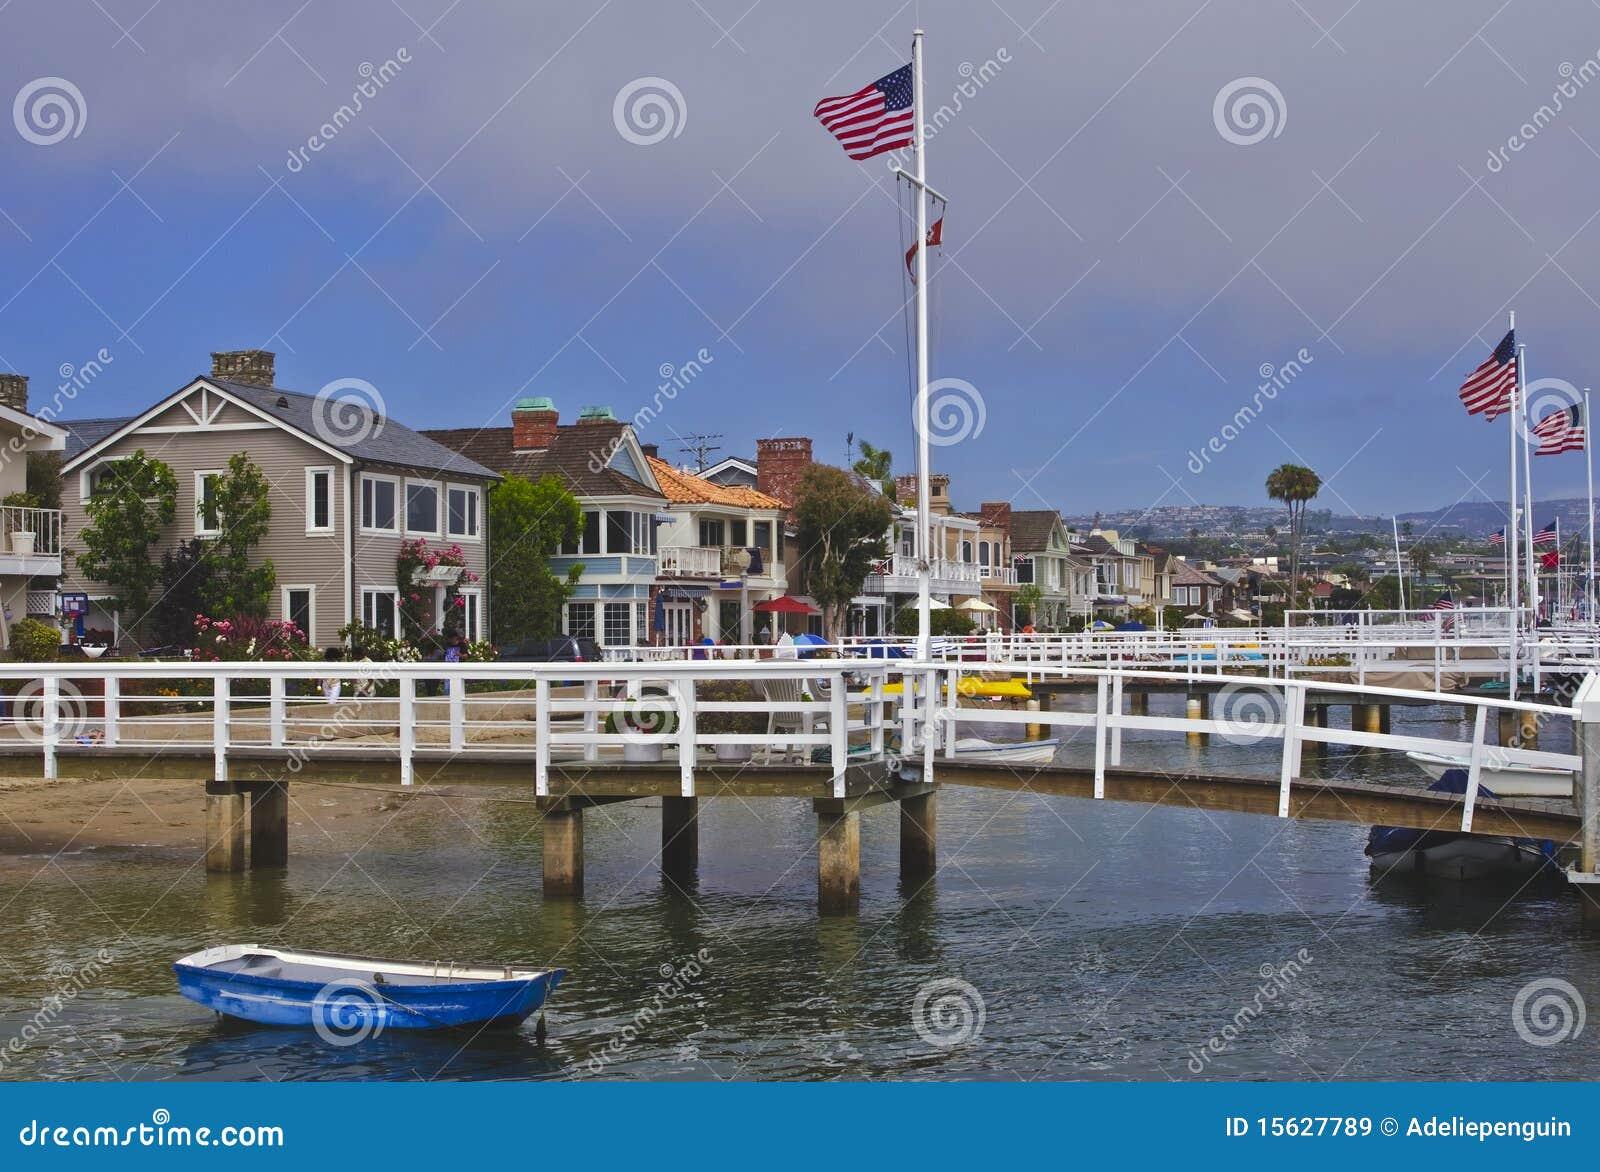 How Many Houses Are On Balboa Island